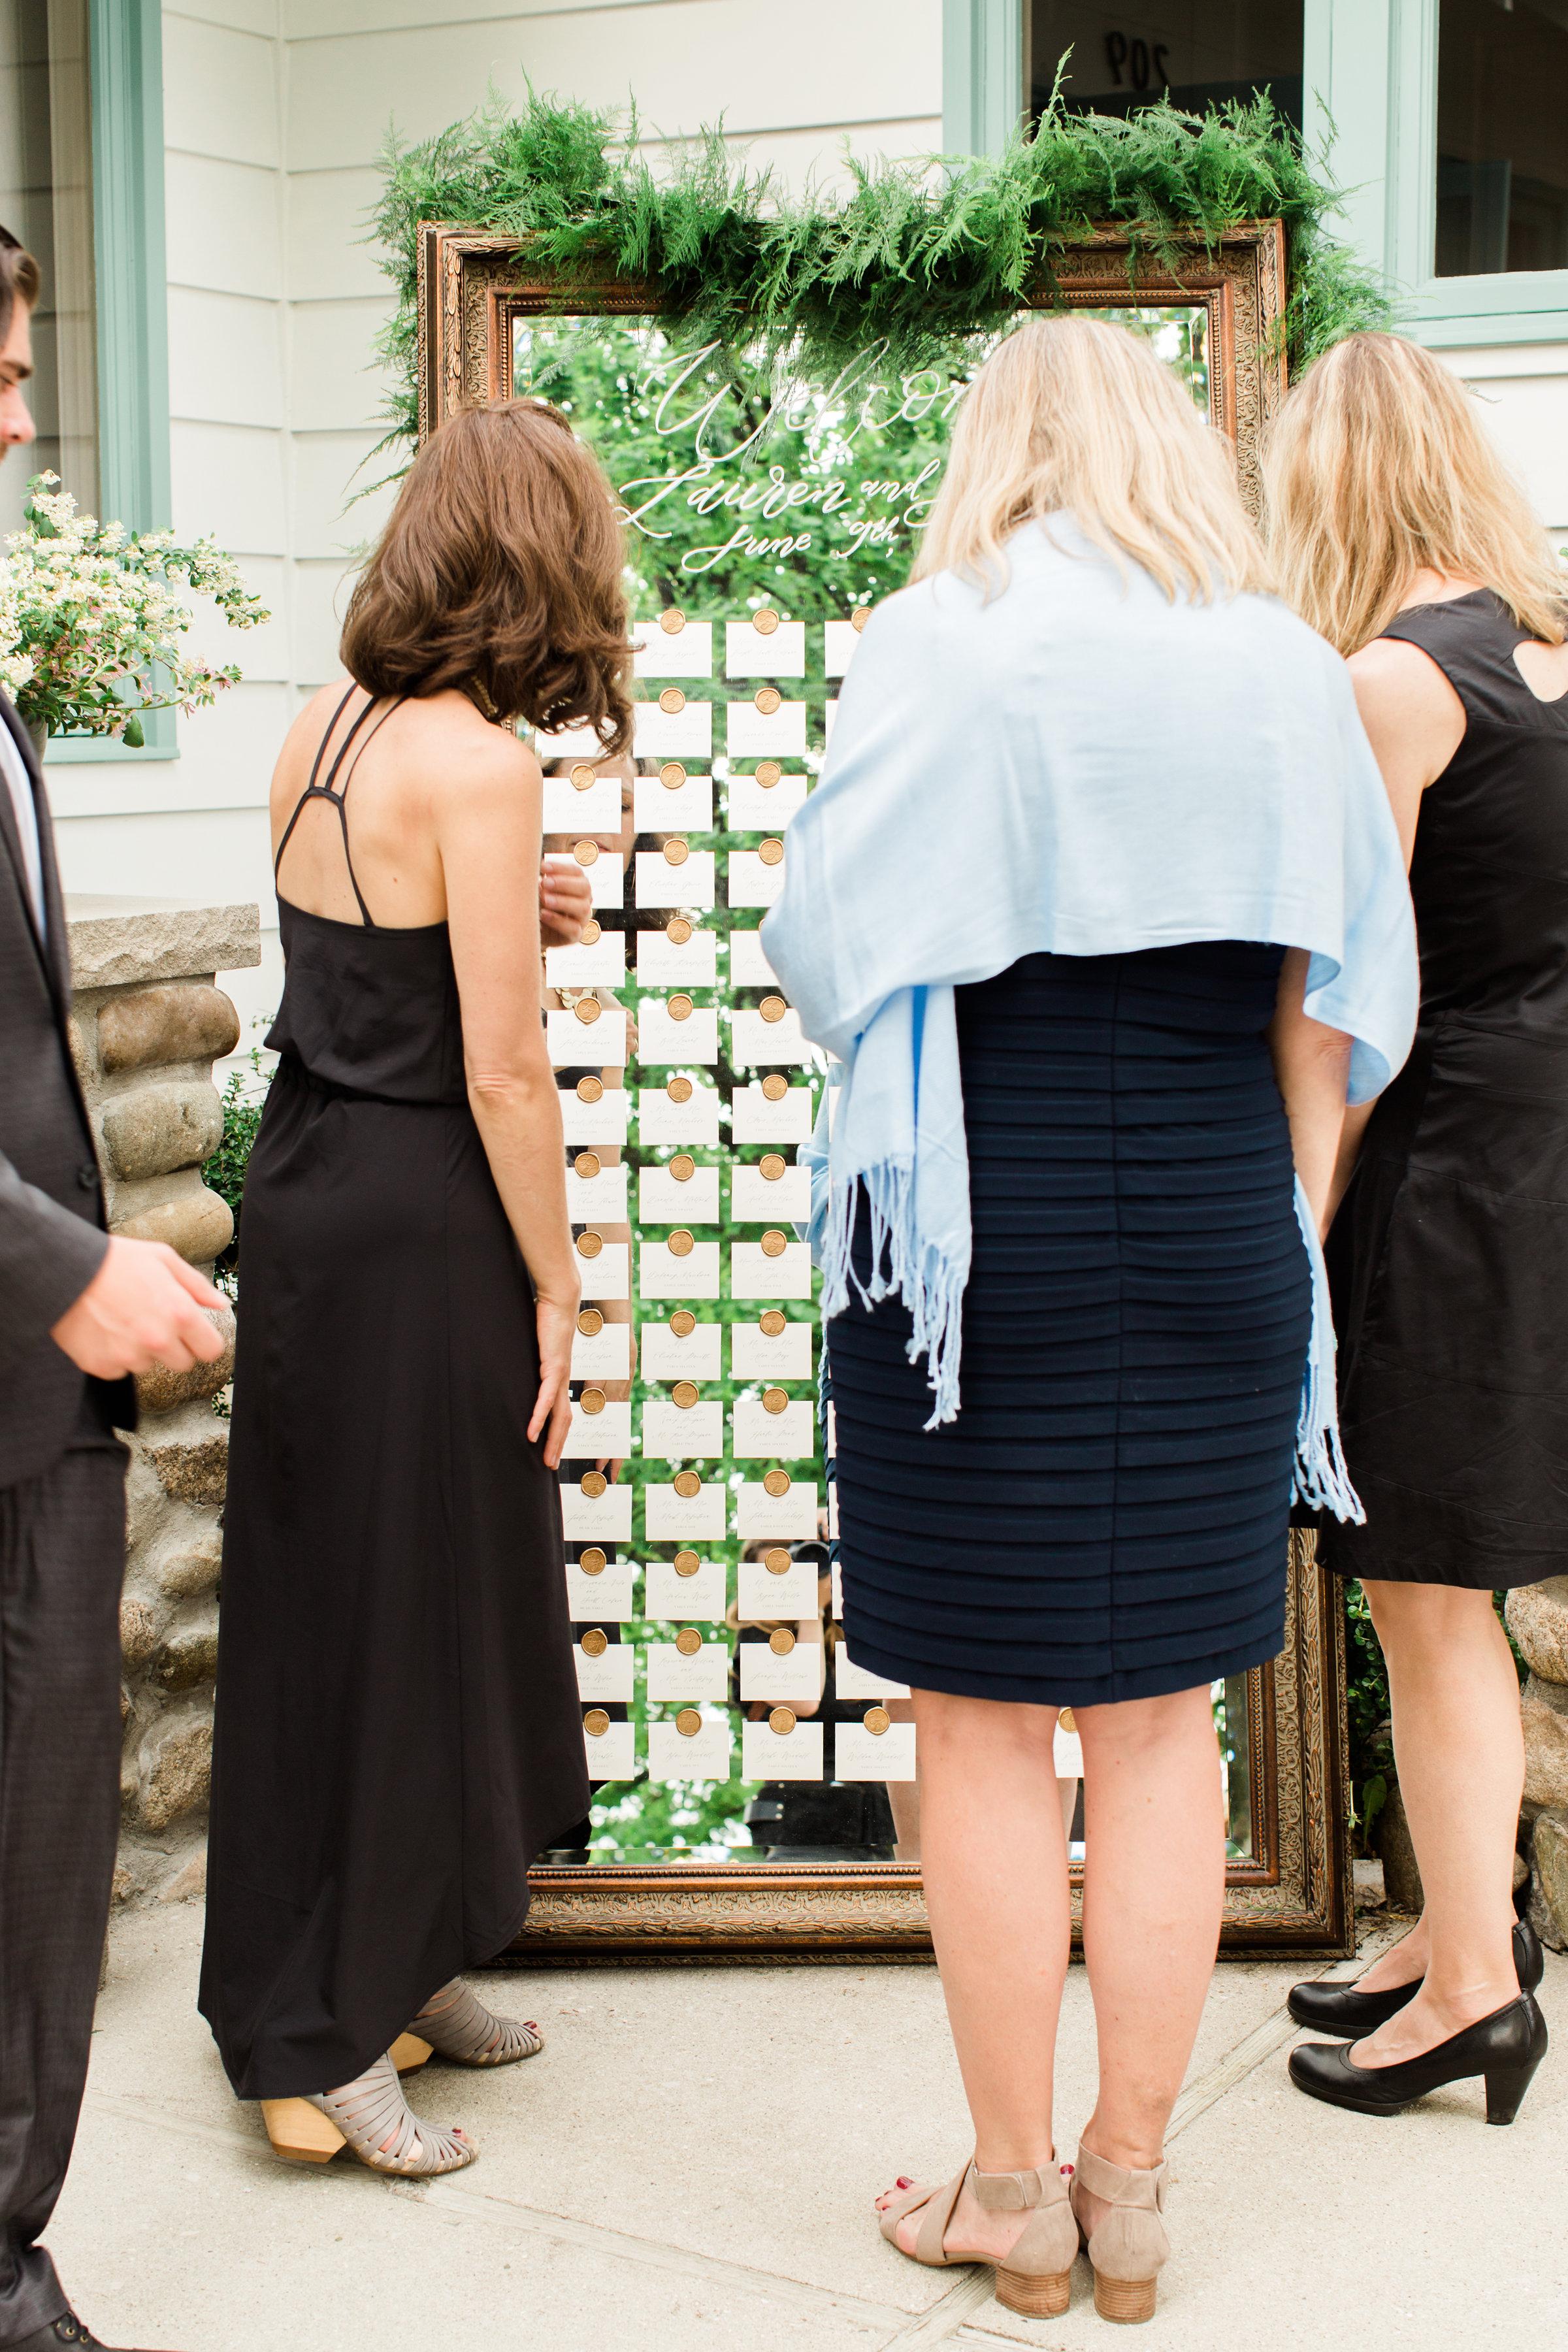 Coffman+Wedding+Cocktail+Hour-94.jpg